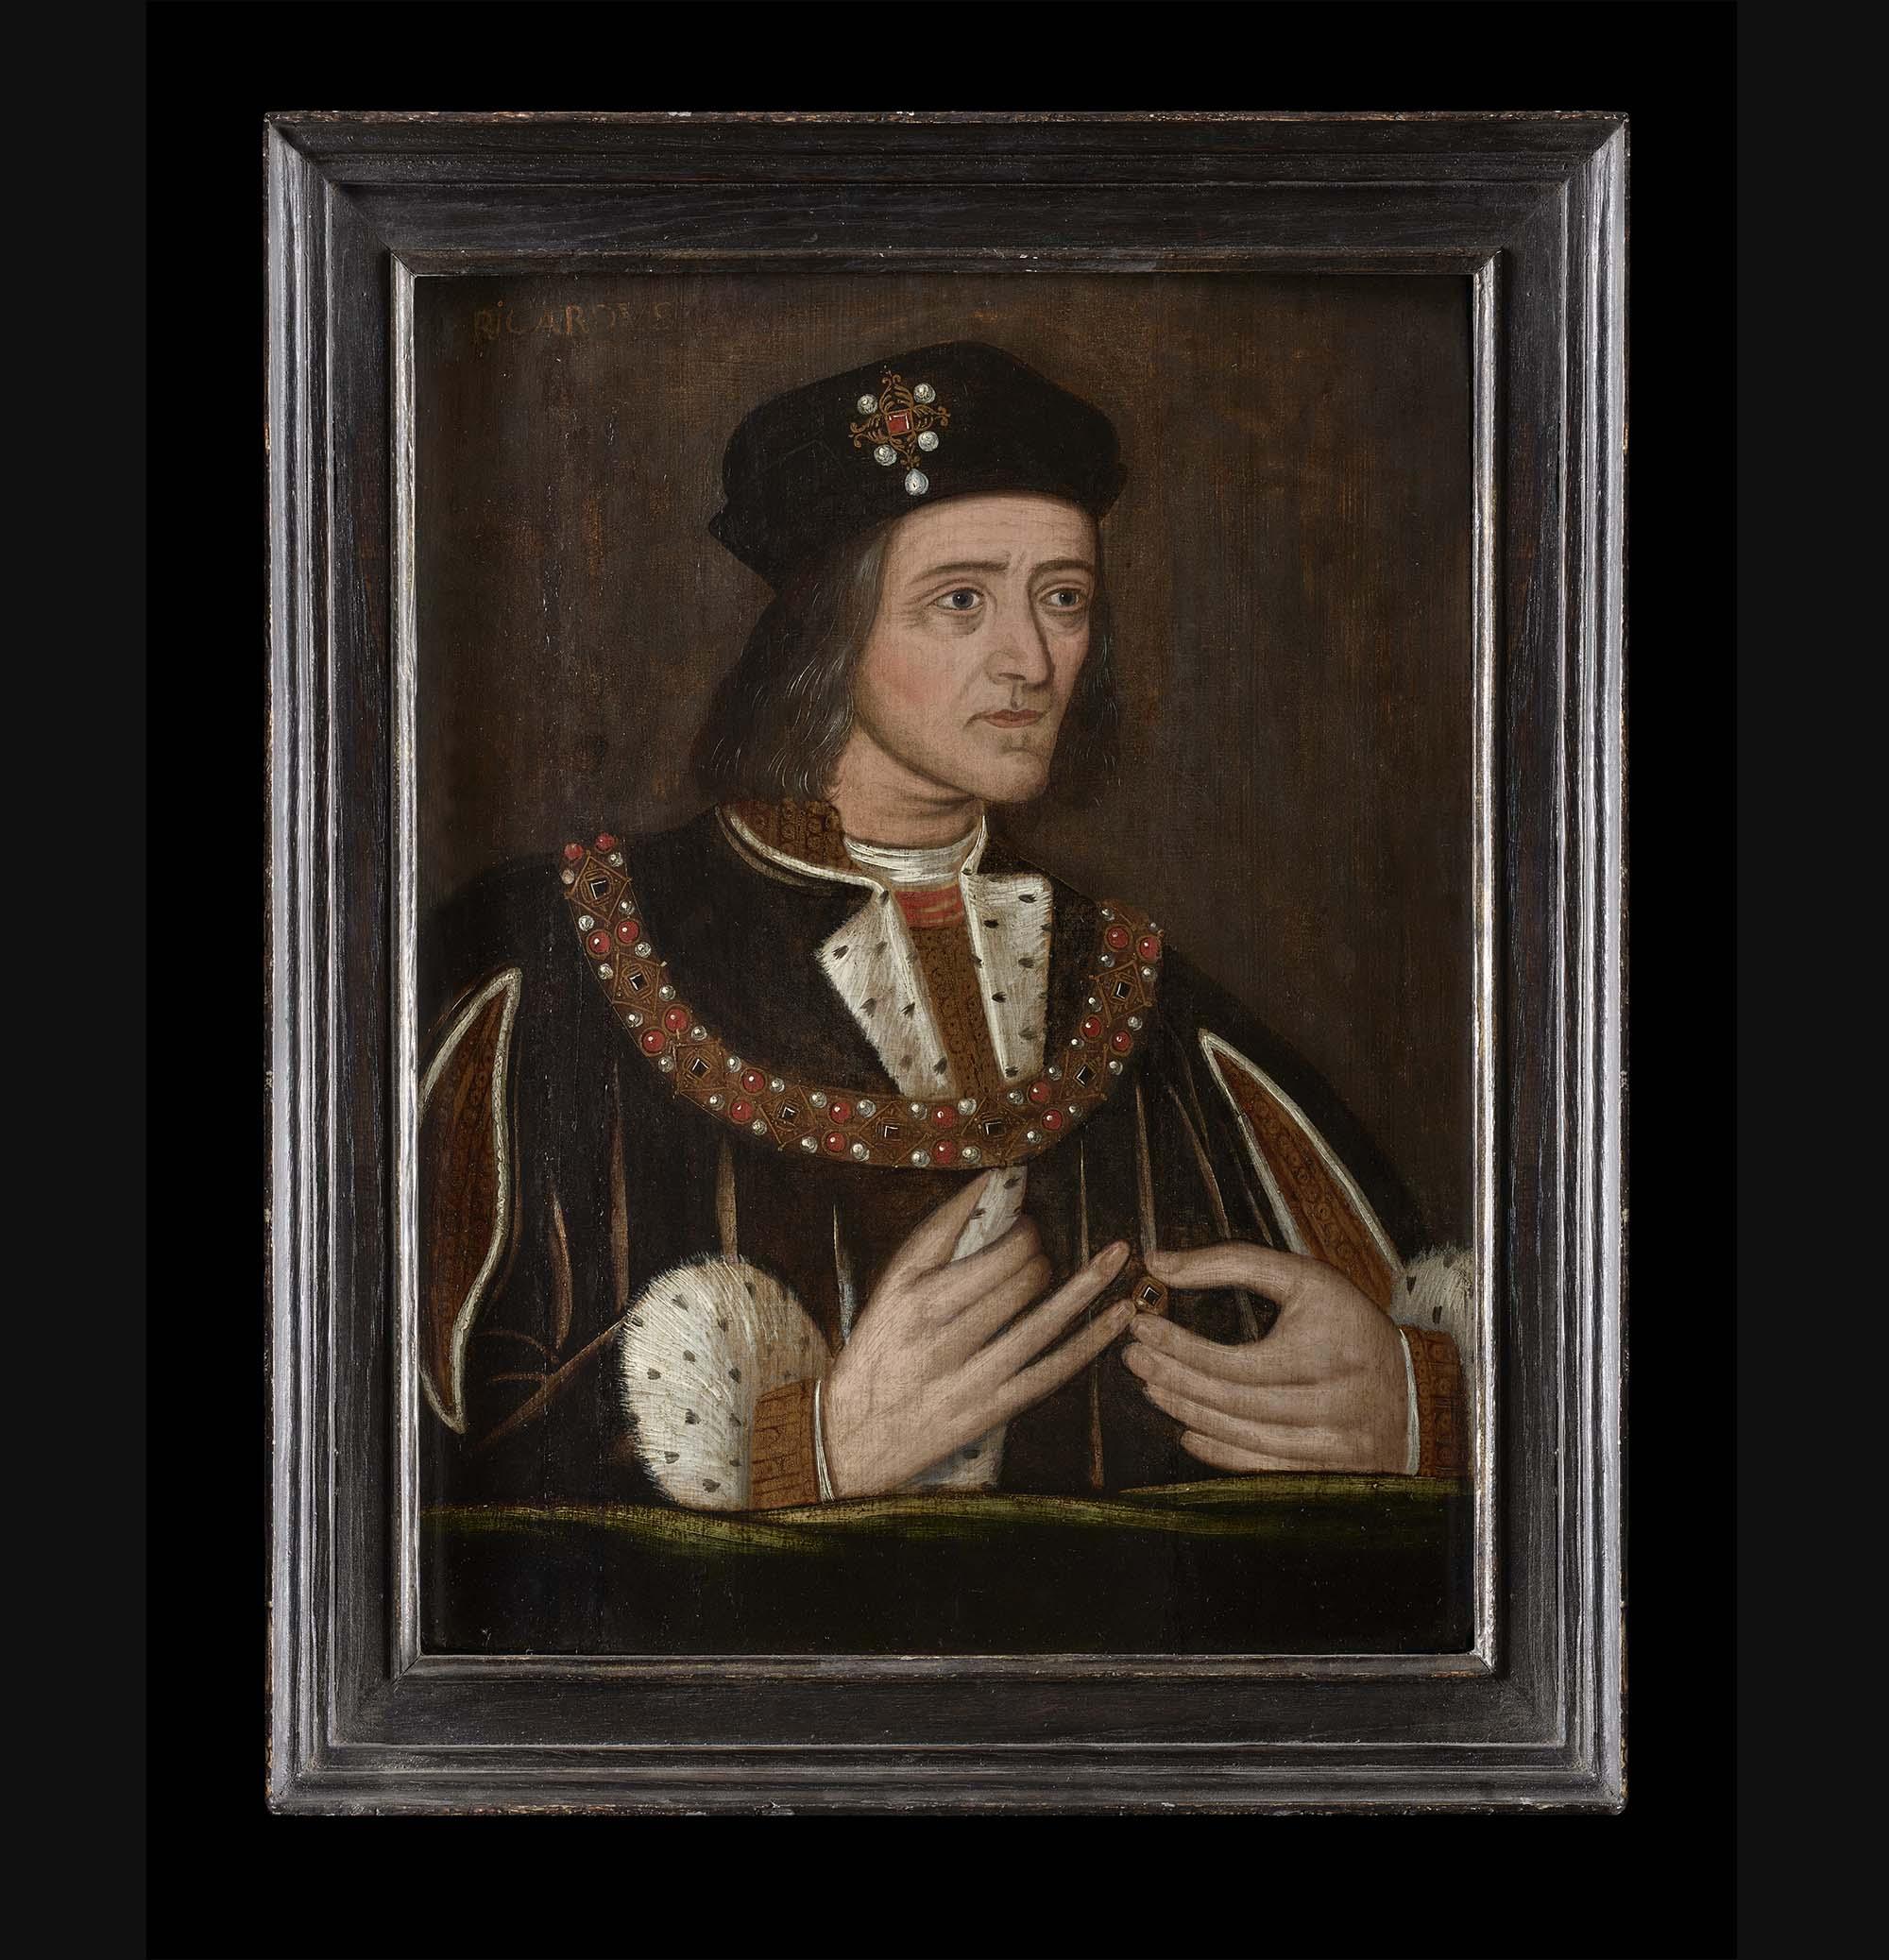 a Tudor portrait of Richard III in a velvet hat and ermine cloak